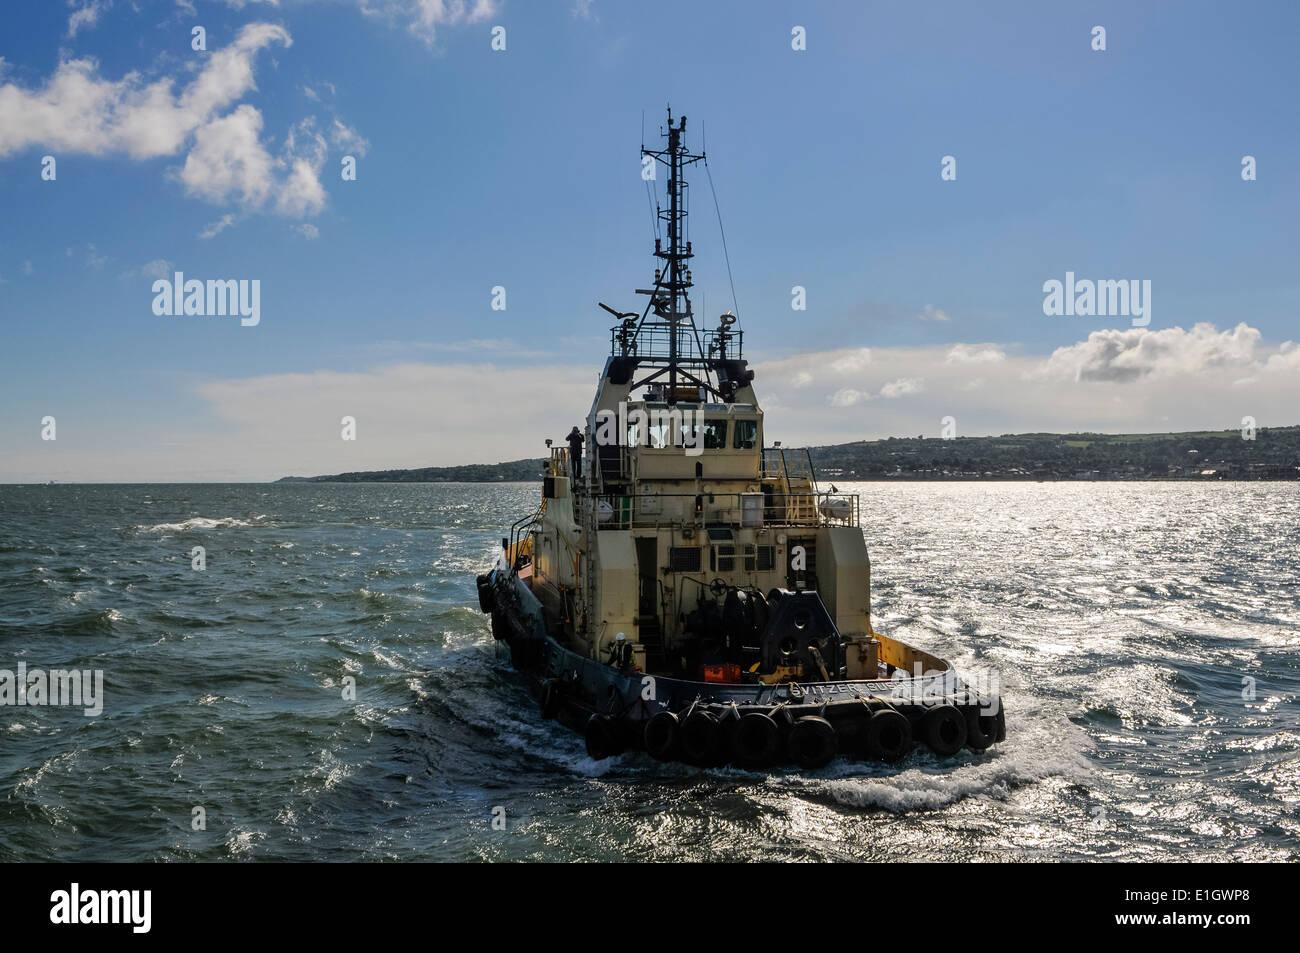 Svitzer Sussex tug boat, Port of Belfast - Stock Image